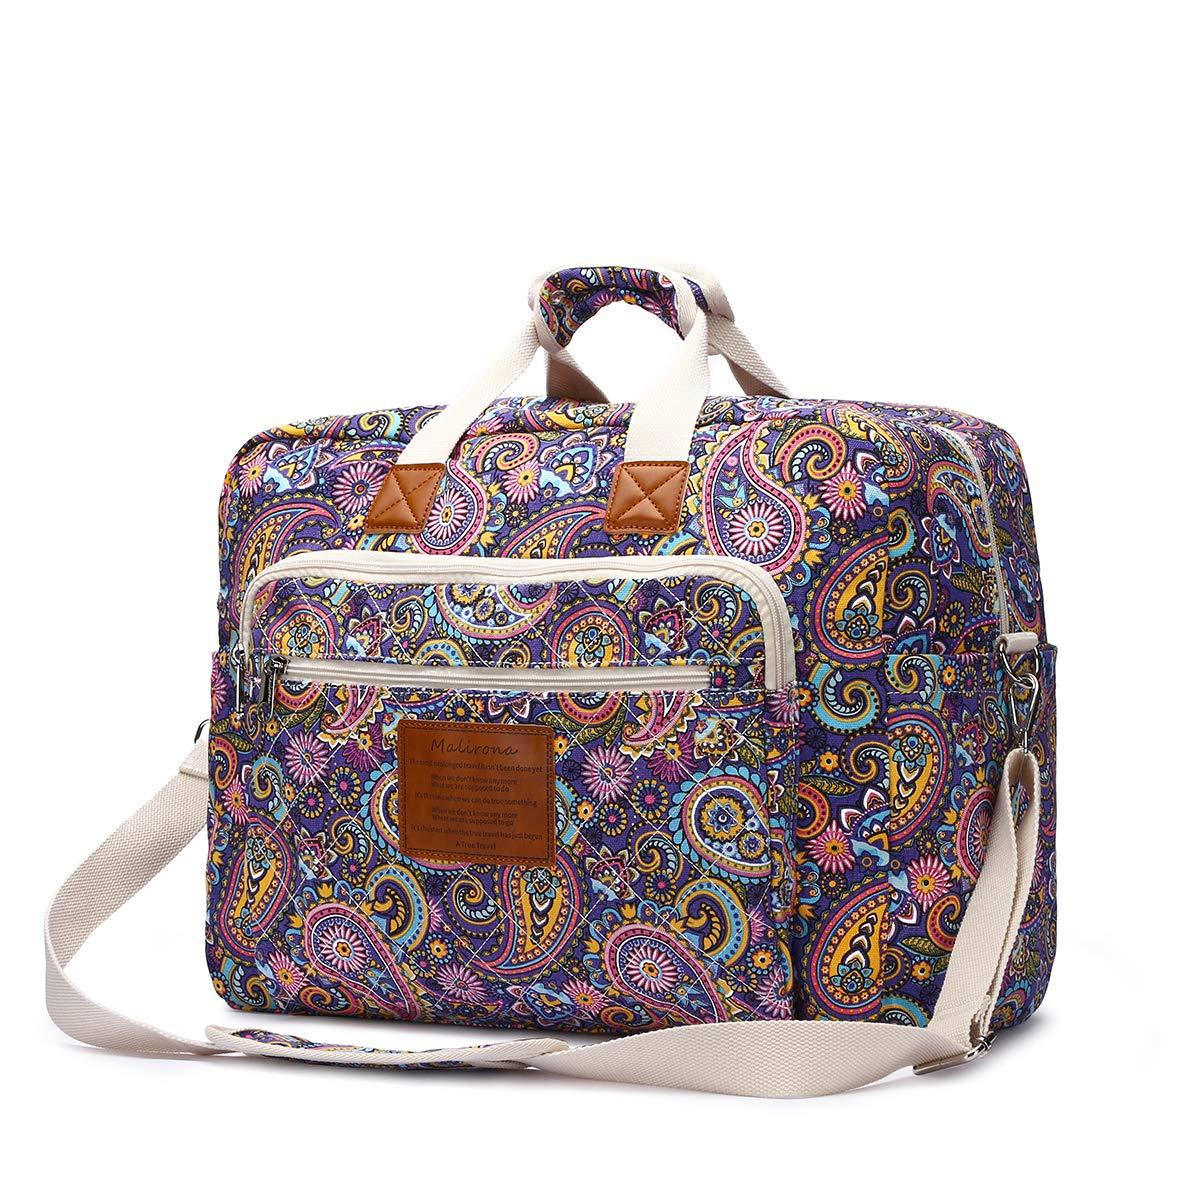 Malirona Women's Canvas Overnight Weekender Bag Carry On Travel Duffel Tote Bag Bohemian Flower (Purple Flower) by Malirona (Image #2)